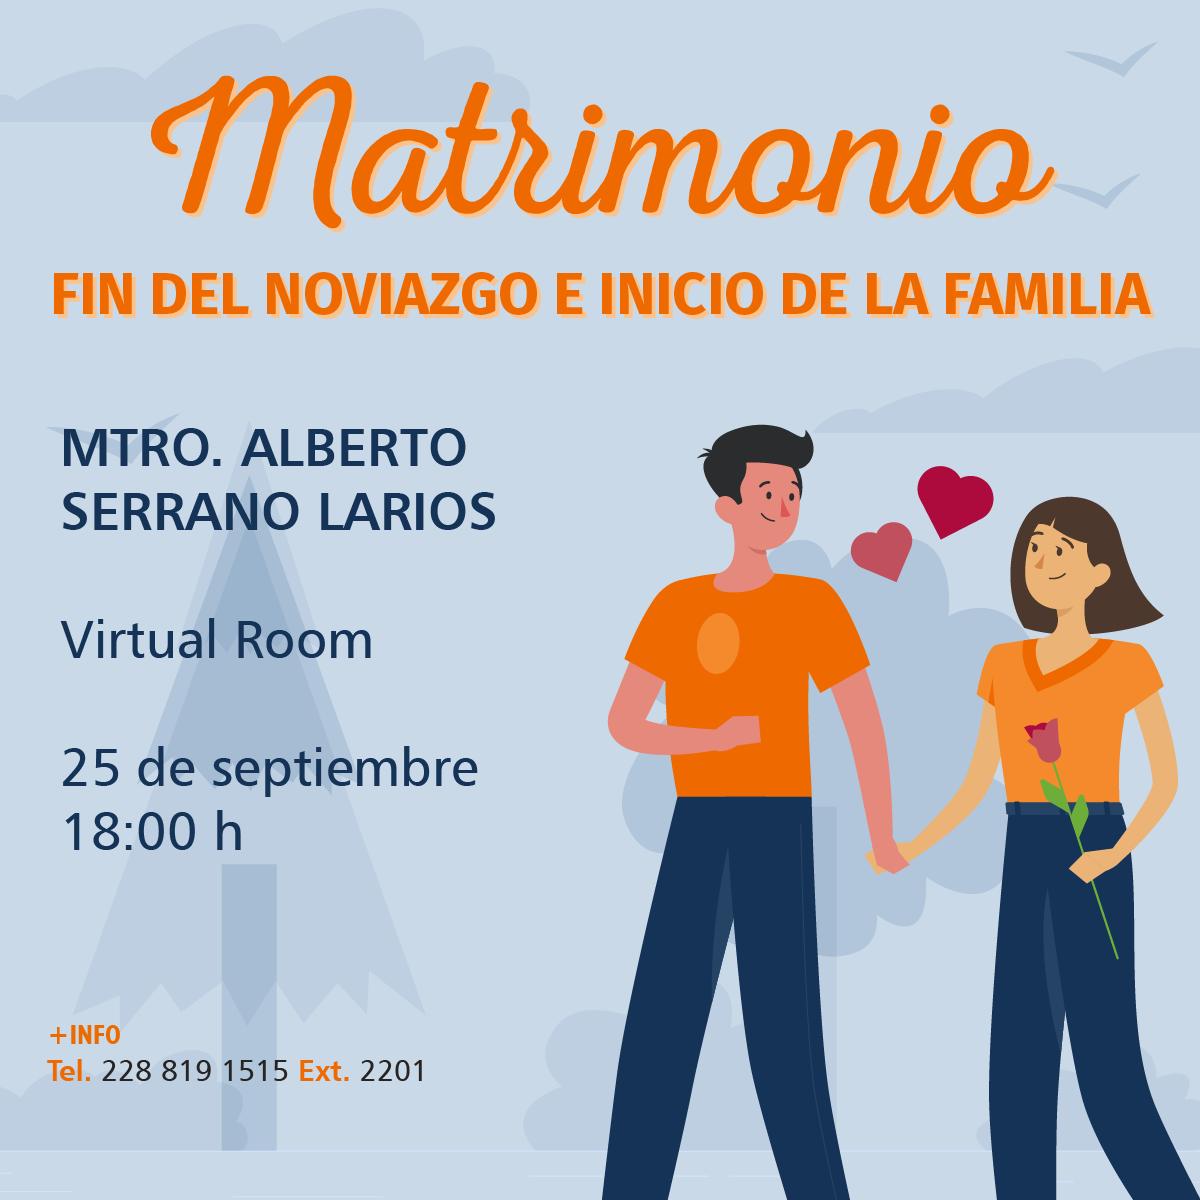 Matrimonio: Fin del Noviazgo e Inicio de la Familia